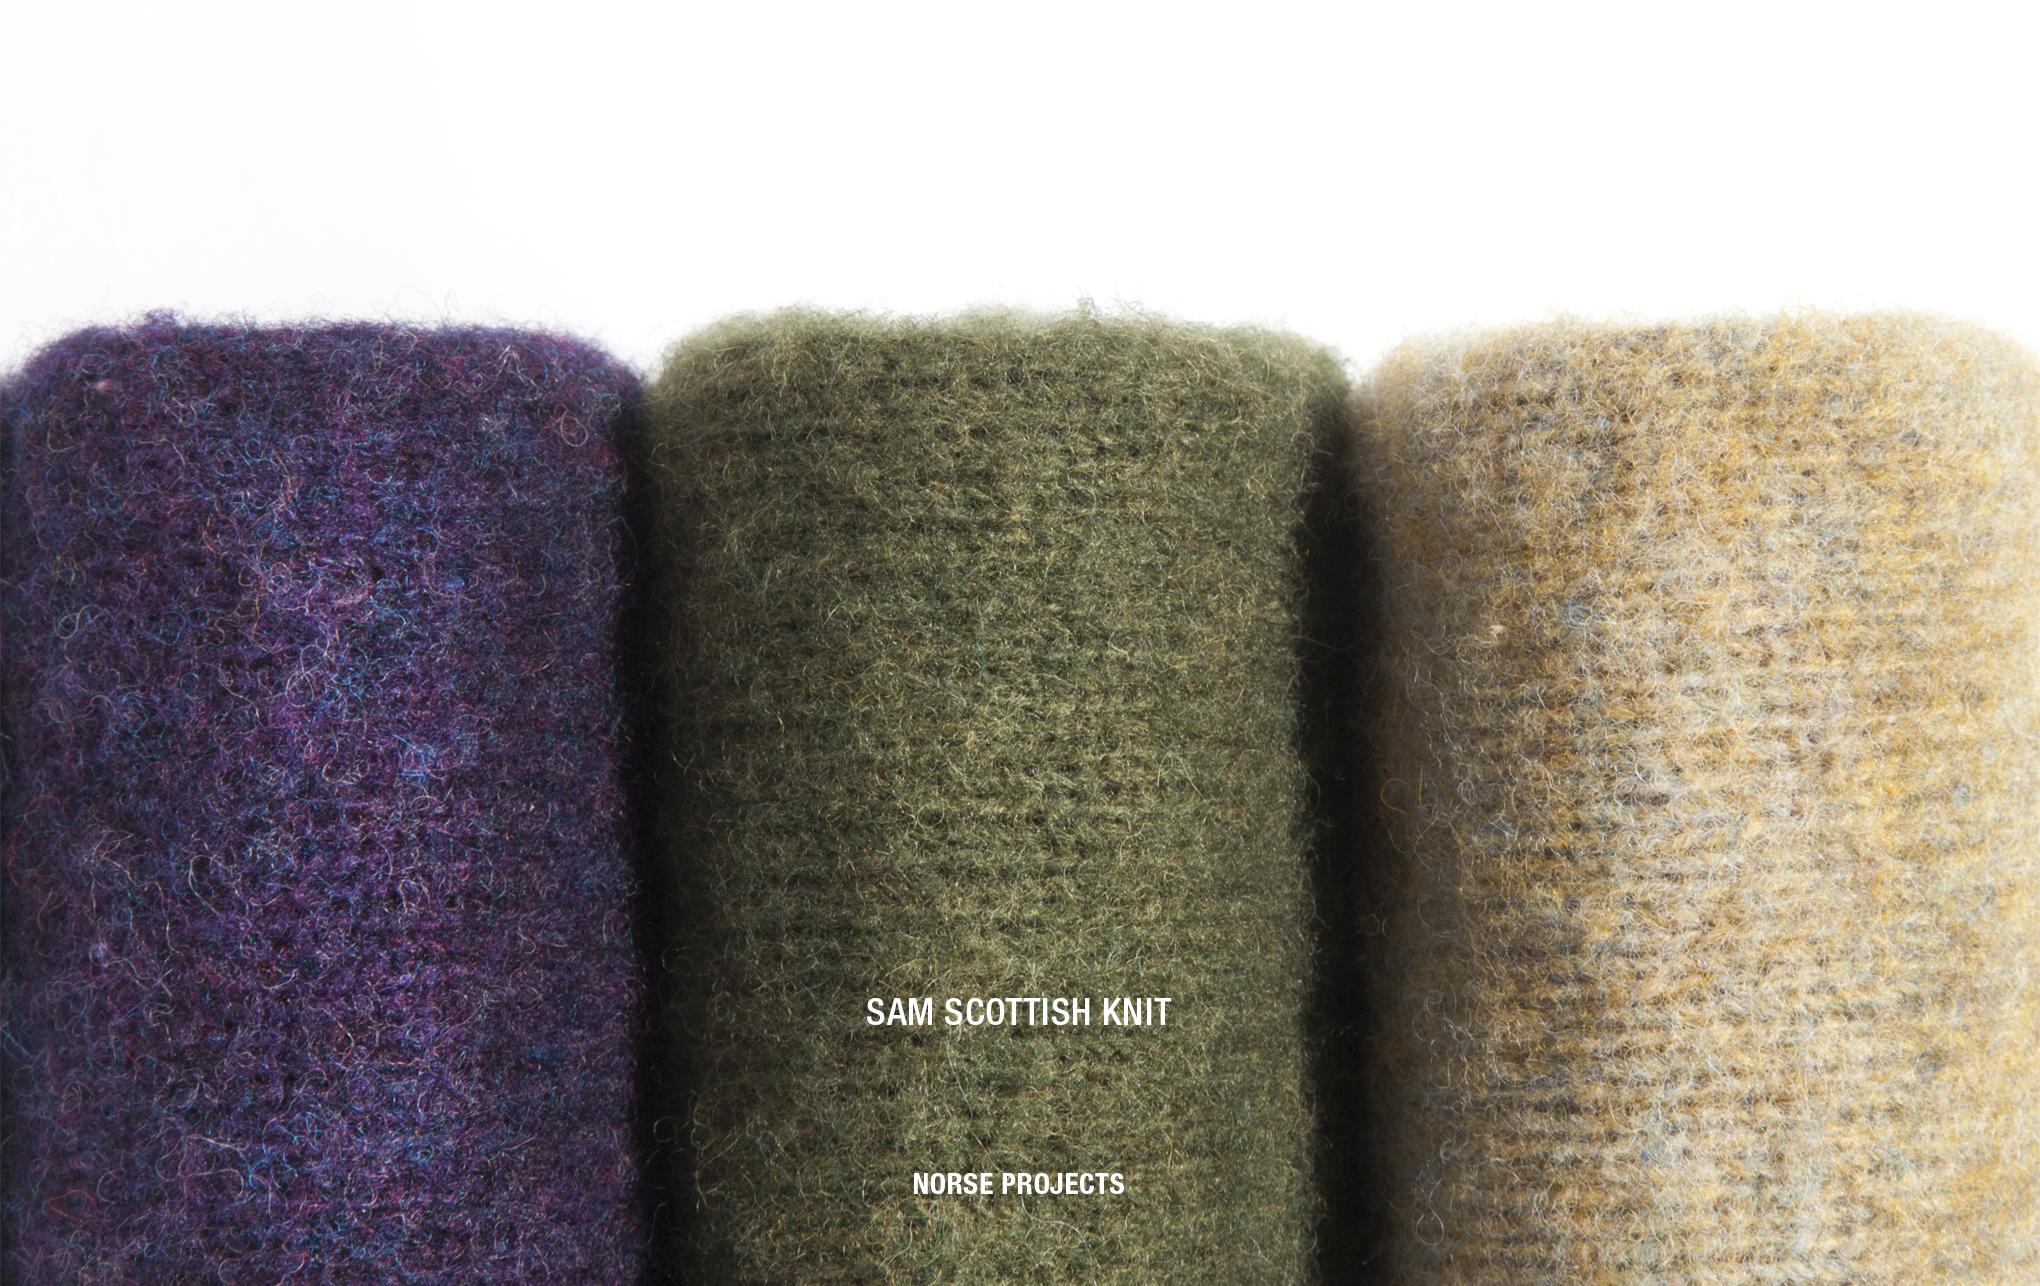 Norse Projects Sam Scottish Knit - Norsestore.com